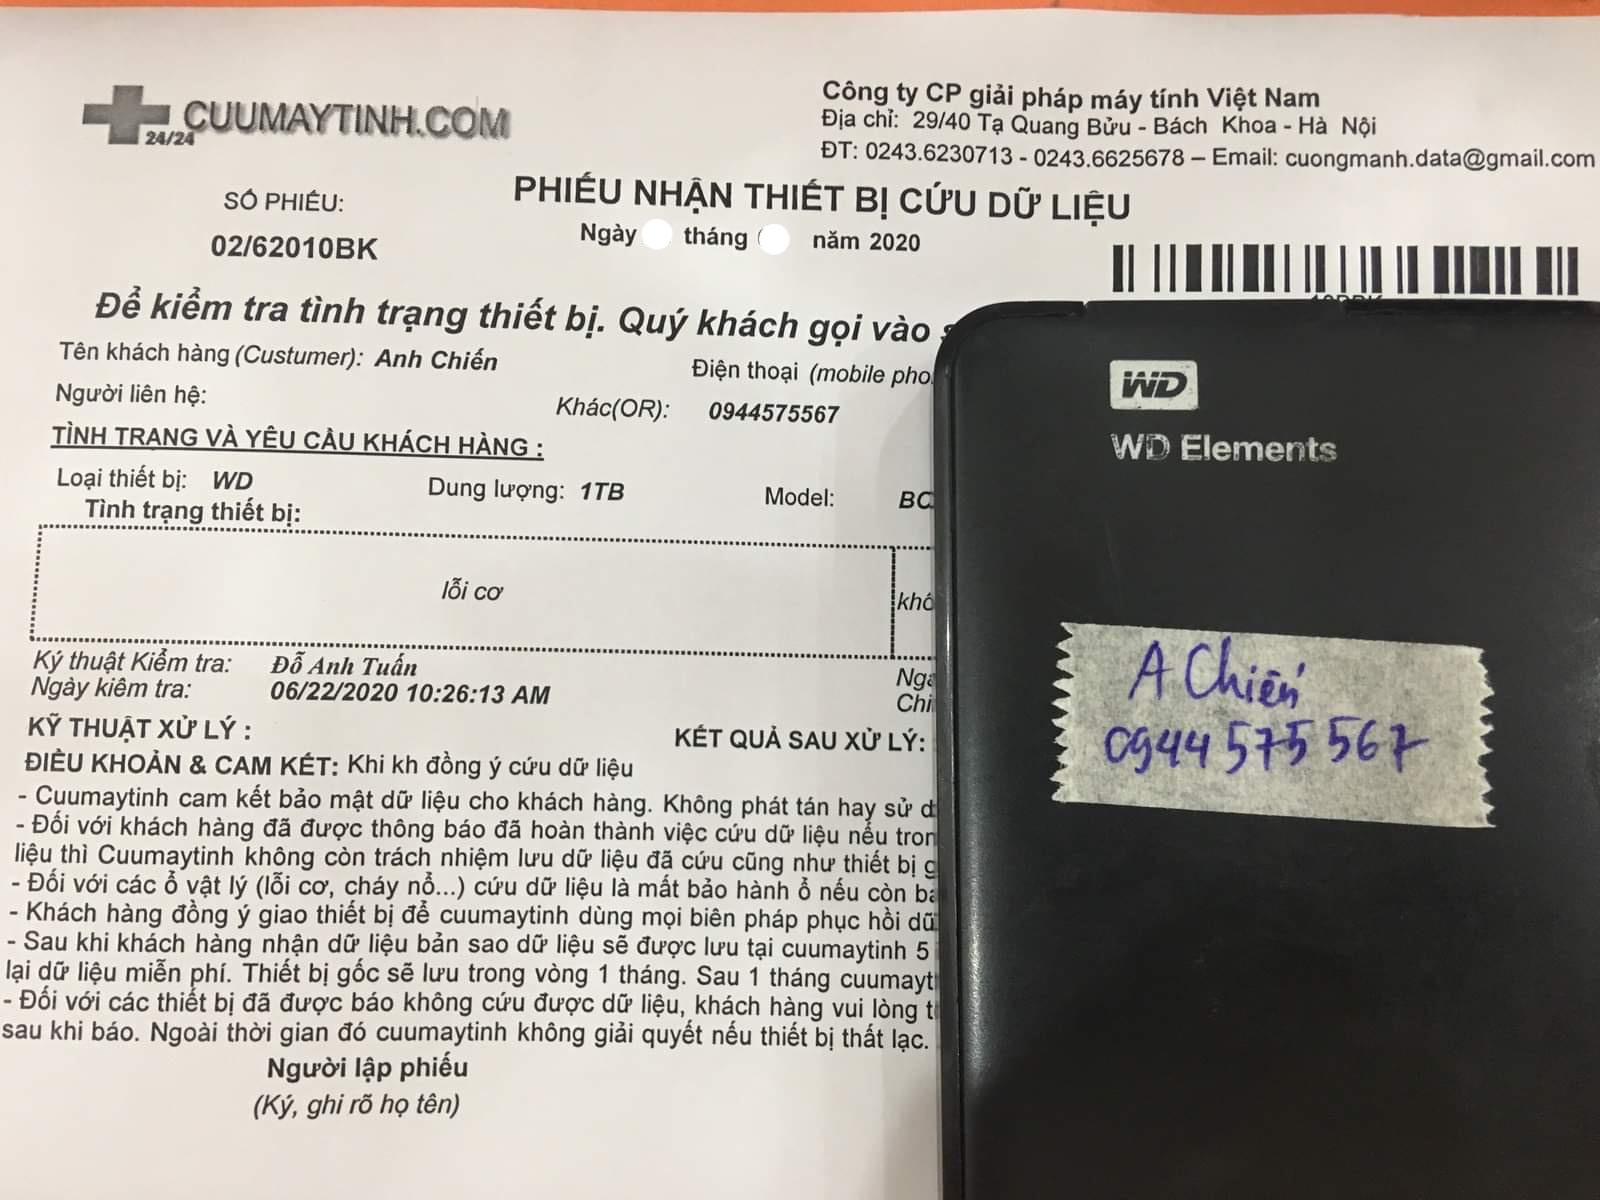 Phục hồi dữ liệu ổ cứng Western 1TB lỗi cơ 03/07/2020 - cuumaytinh